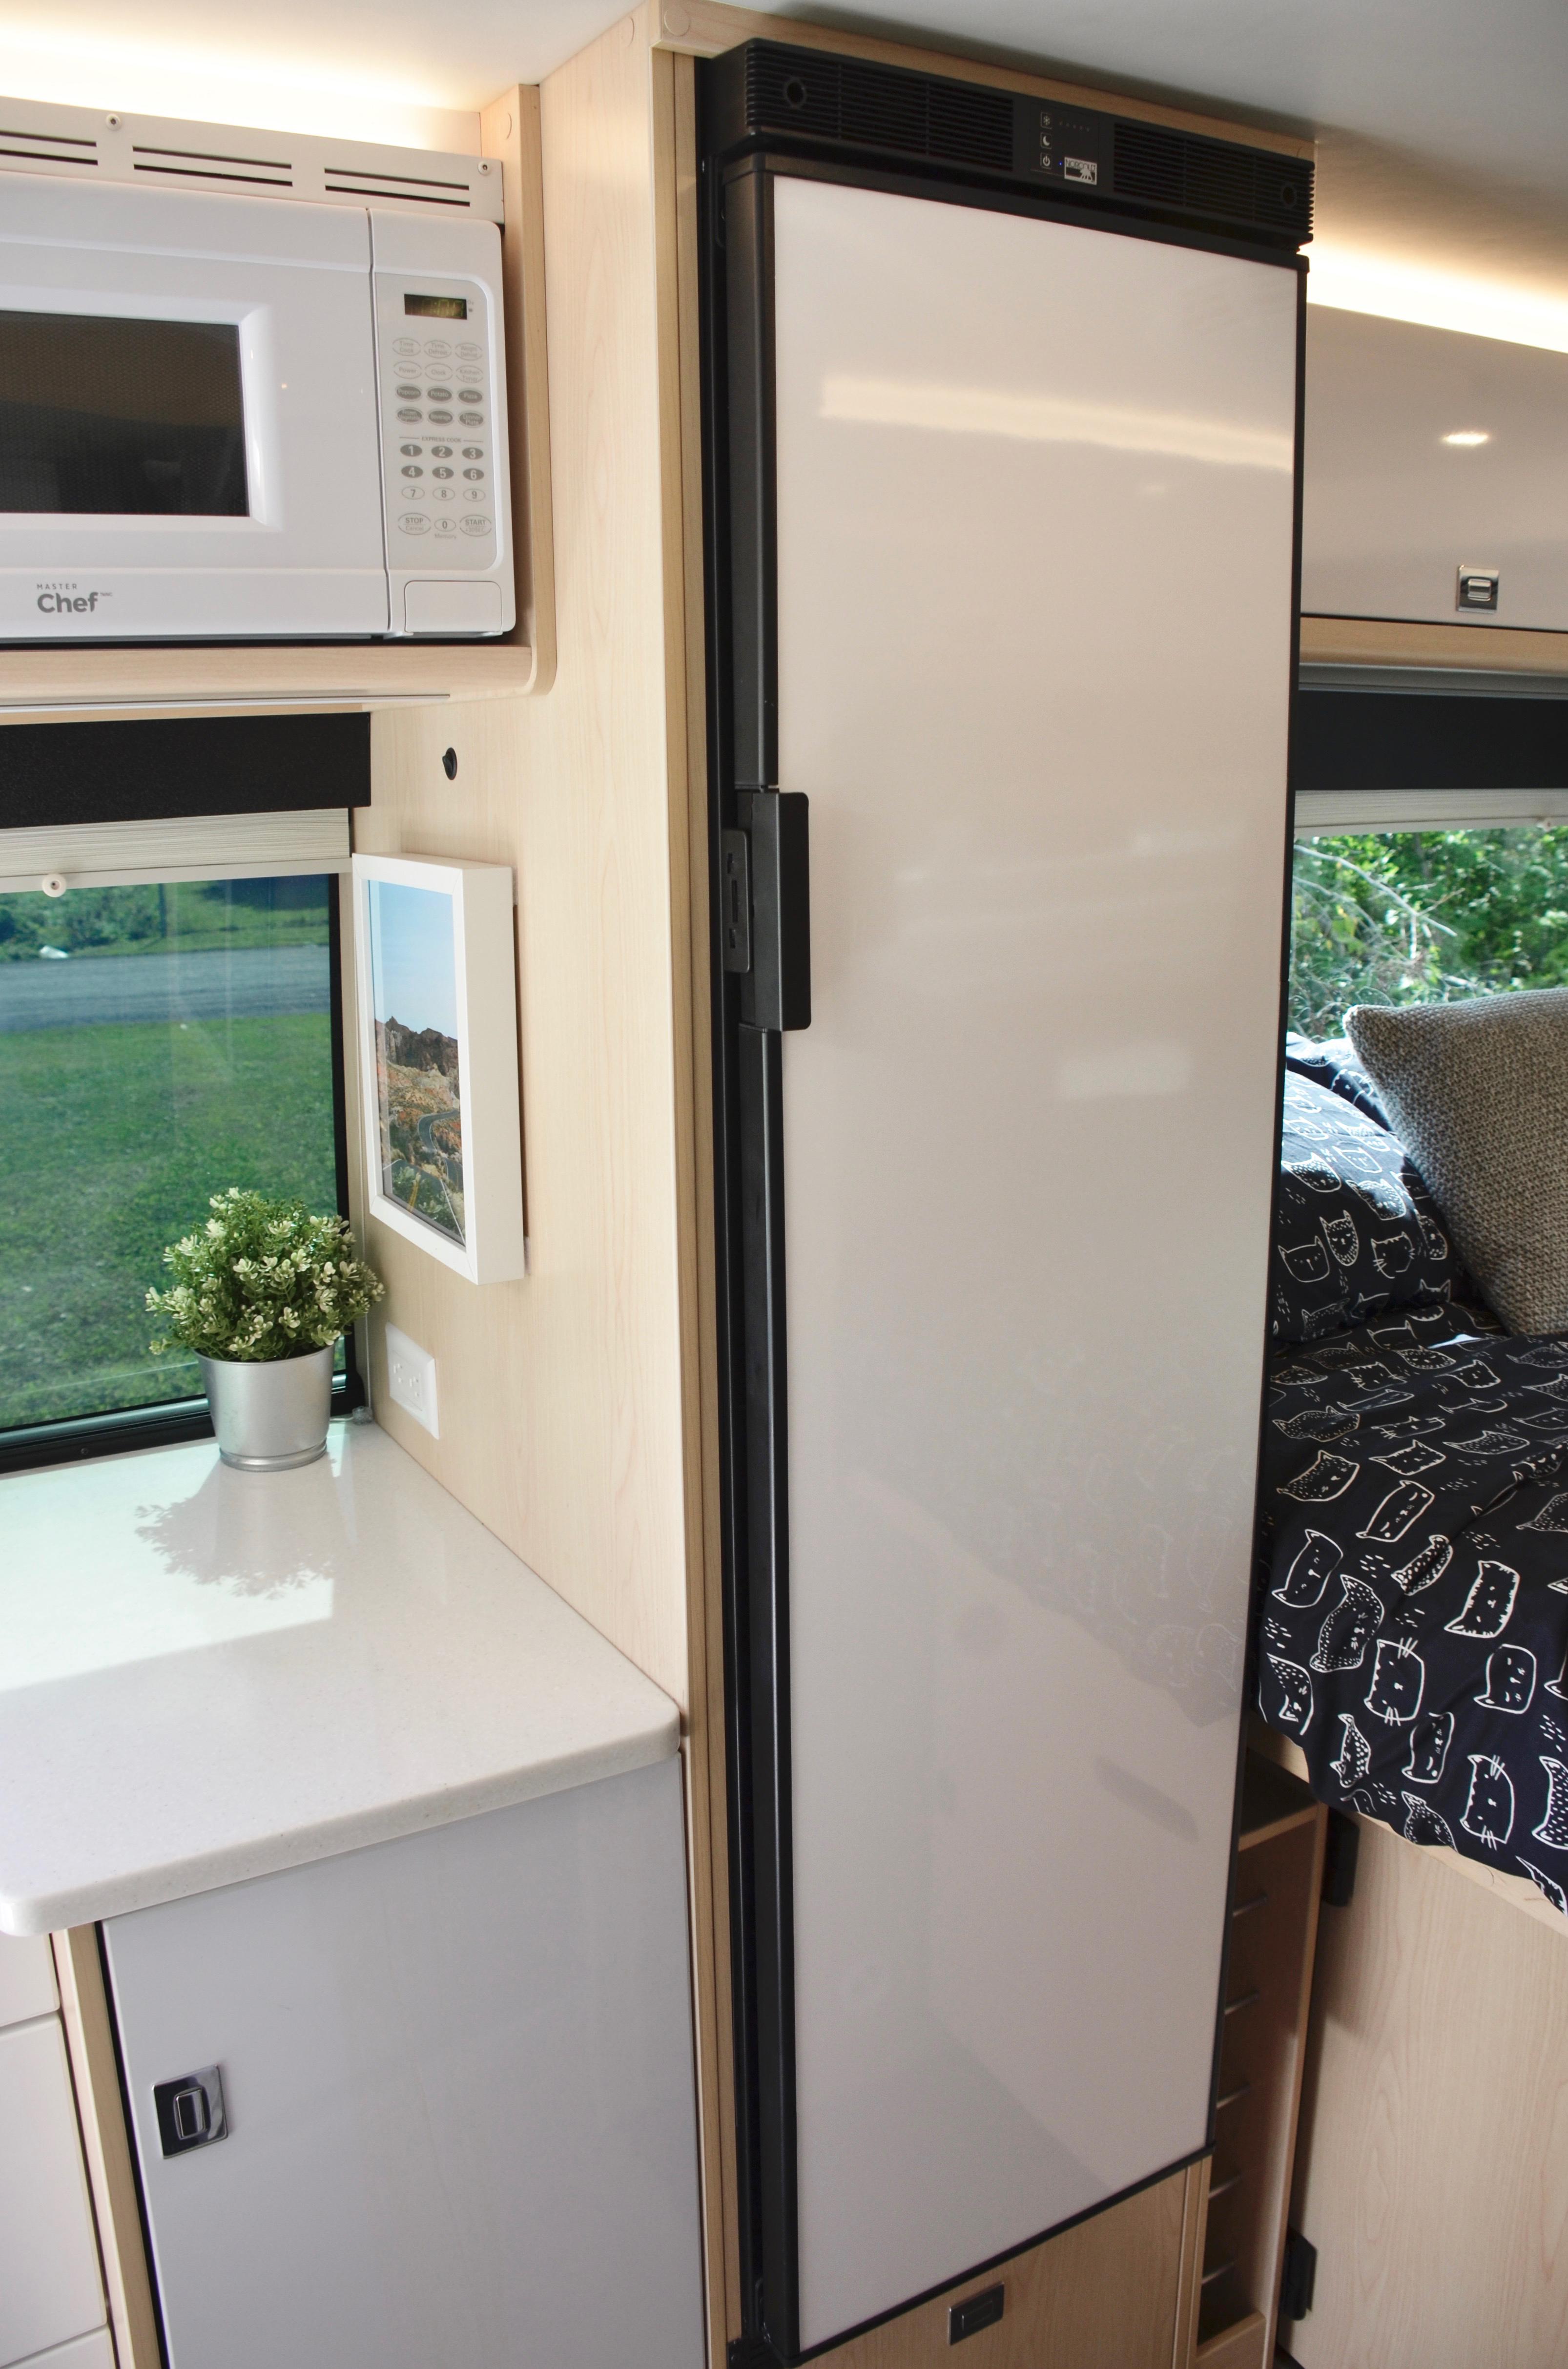 Panoramic RV - Compressor fridge - 3